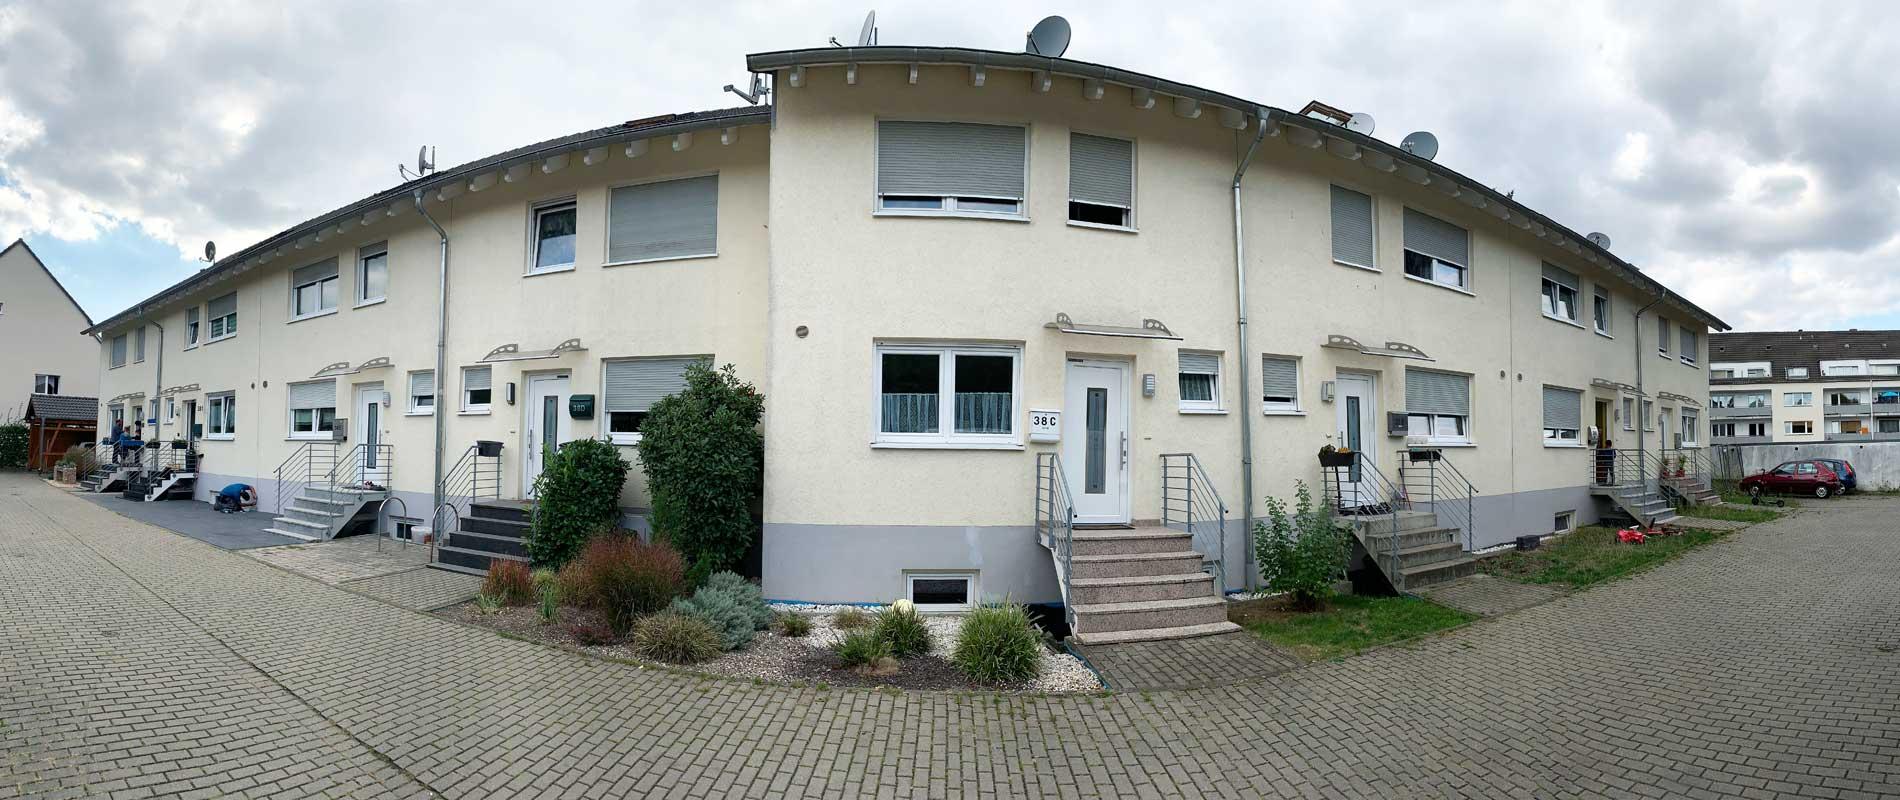 Bau Invest GmbH Reihenhäuser